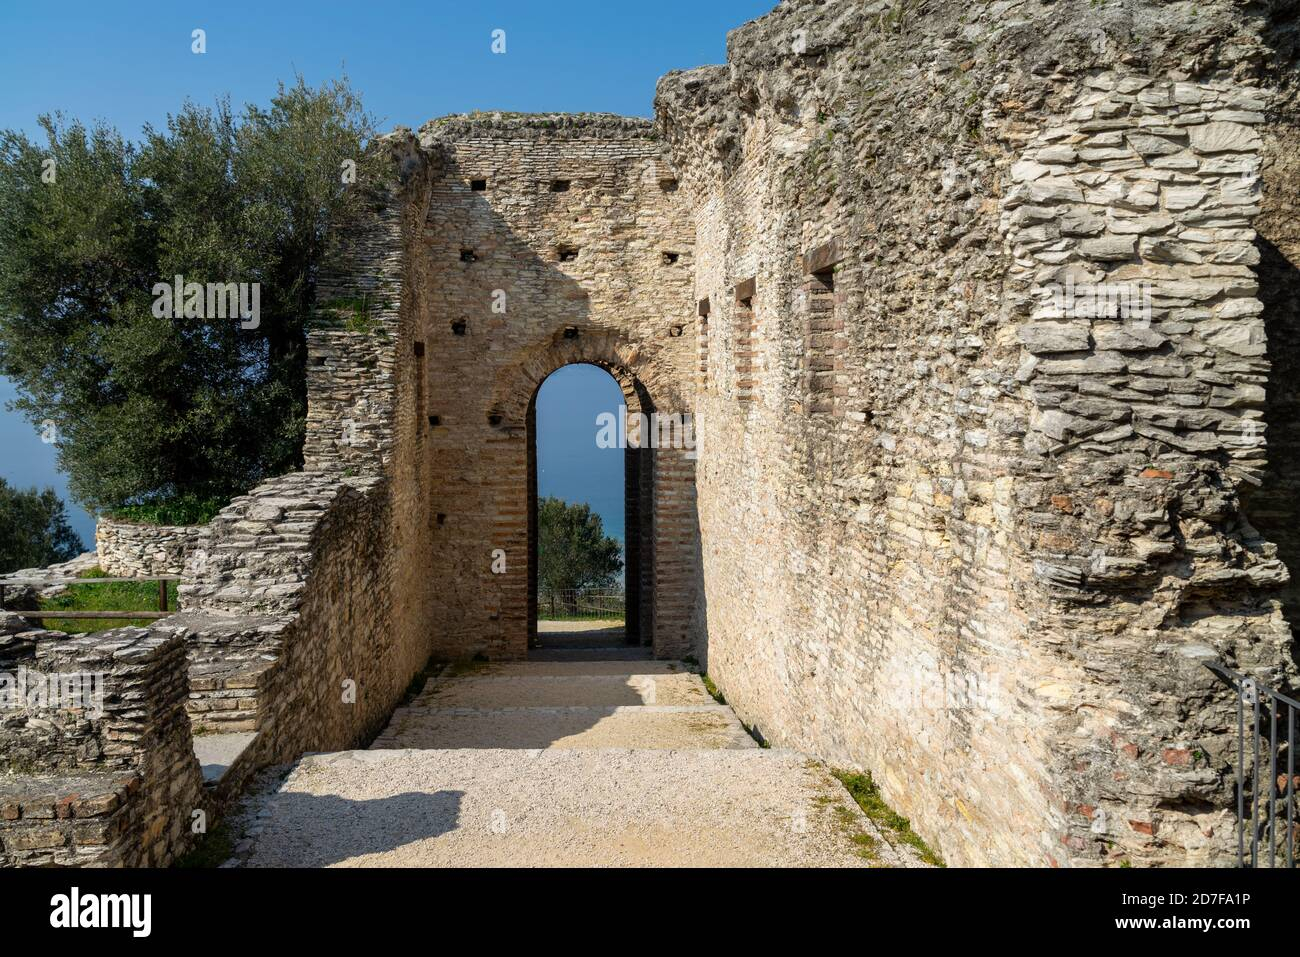 Roman ruins Grotte di Catullo or Grotto at Sirmione, Lake Garda, Northern Italy Stock Photo